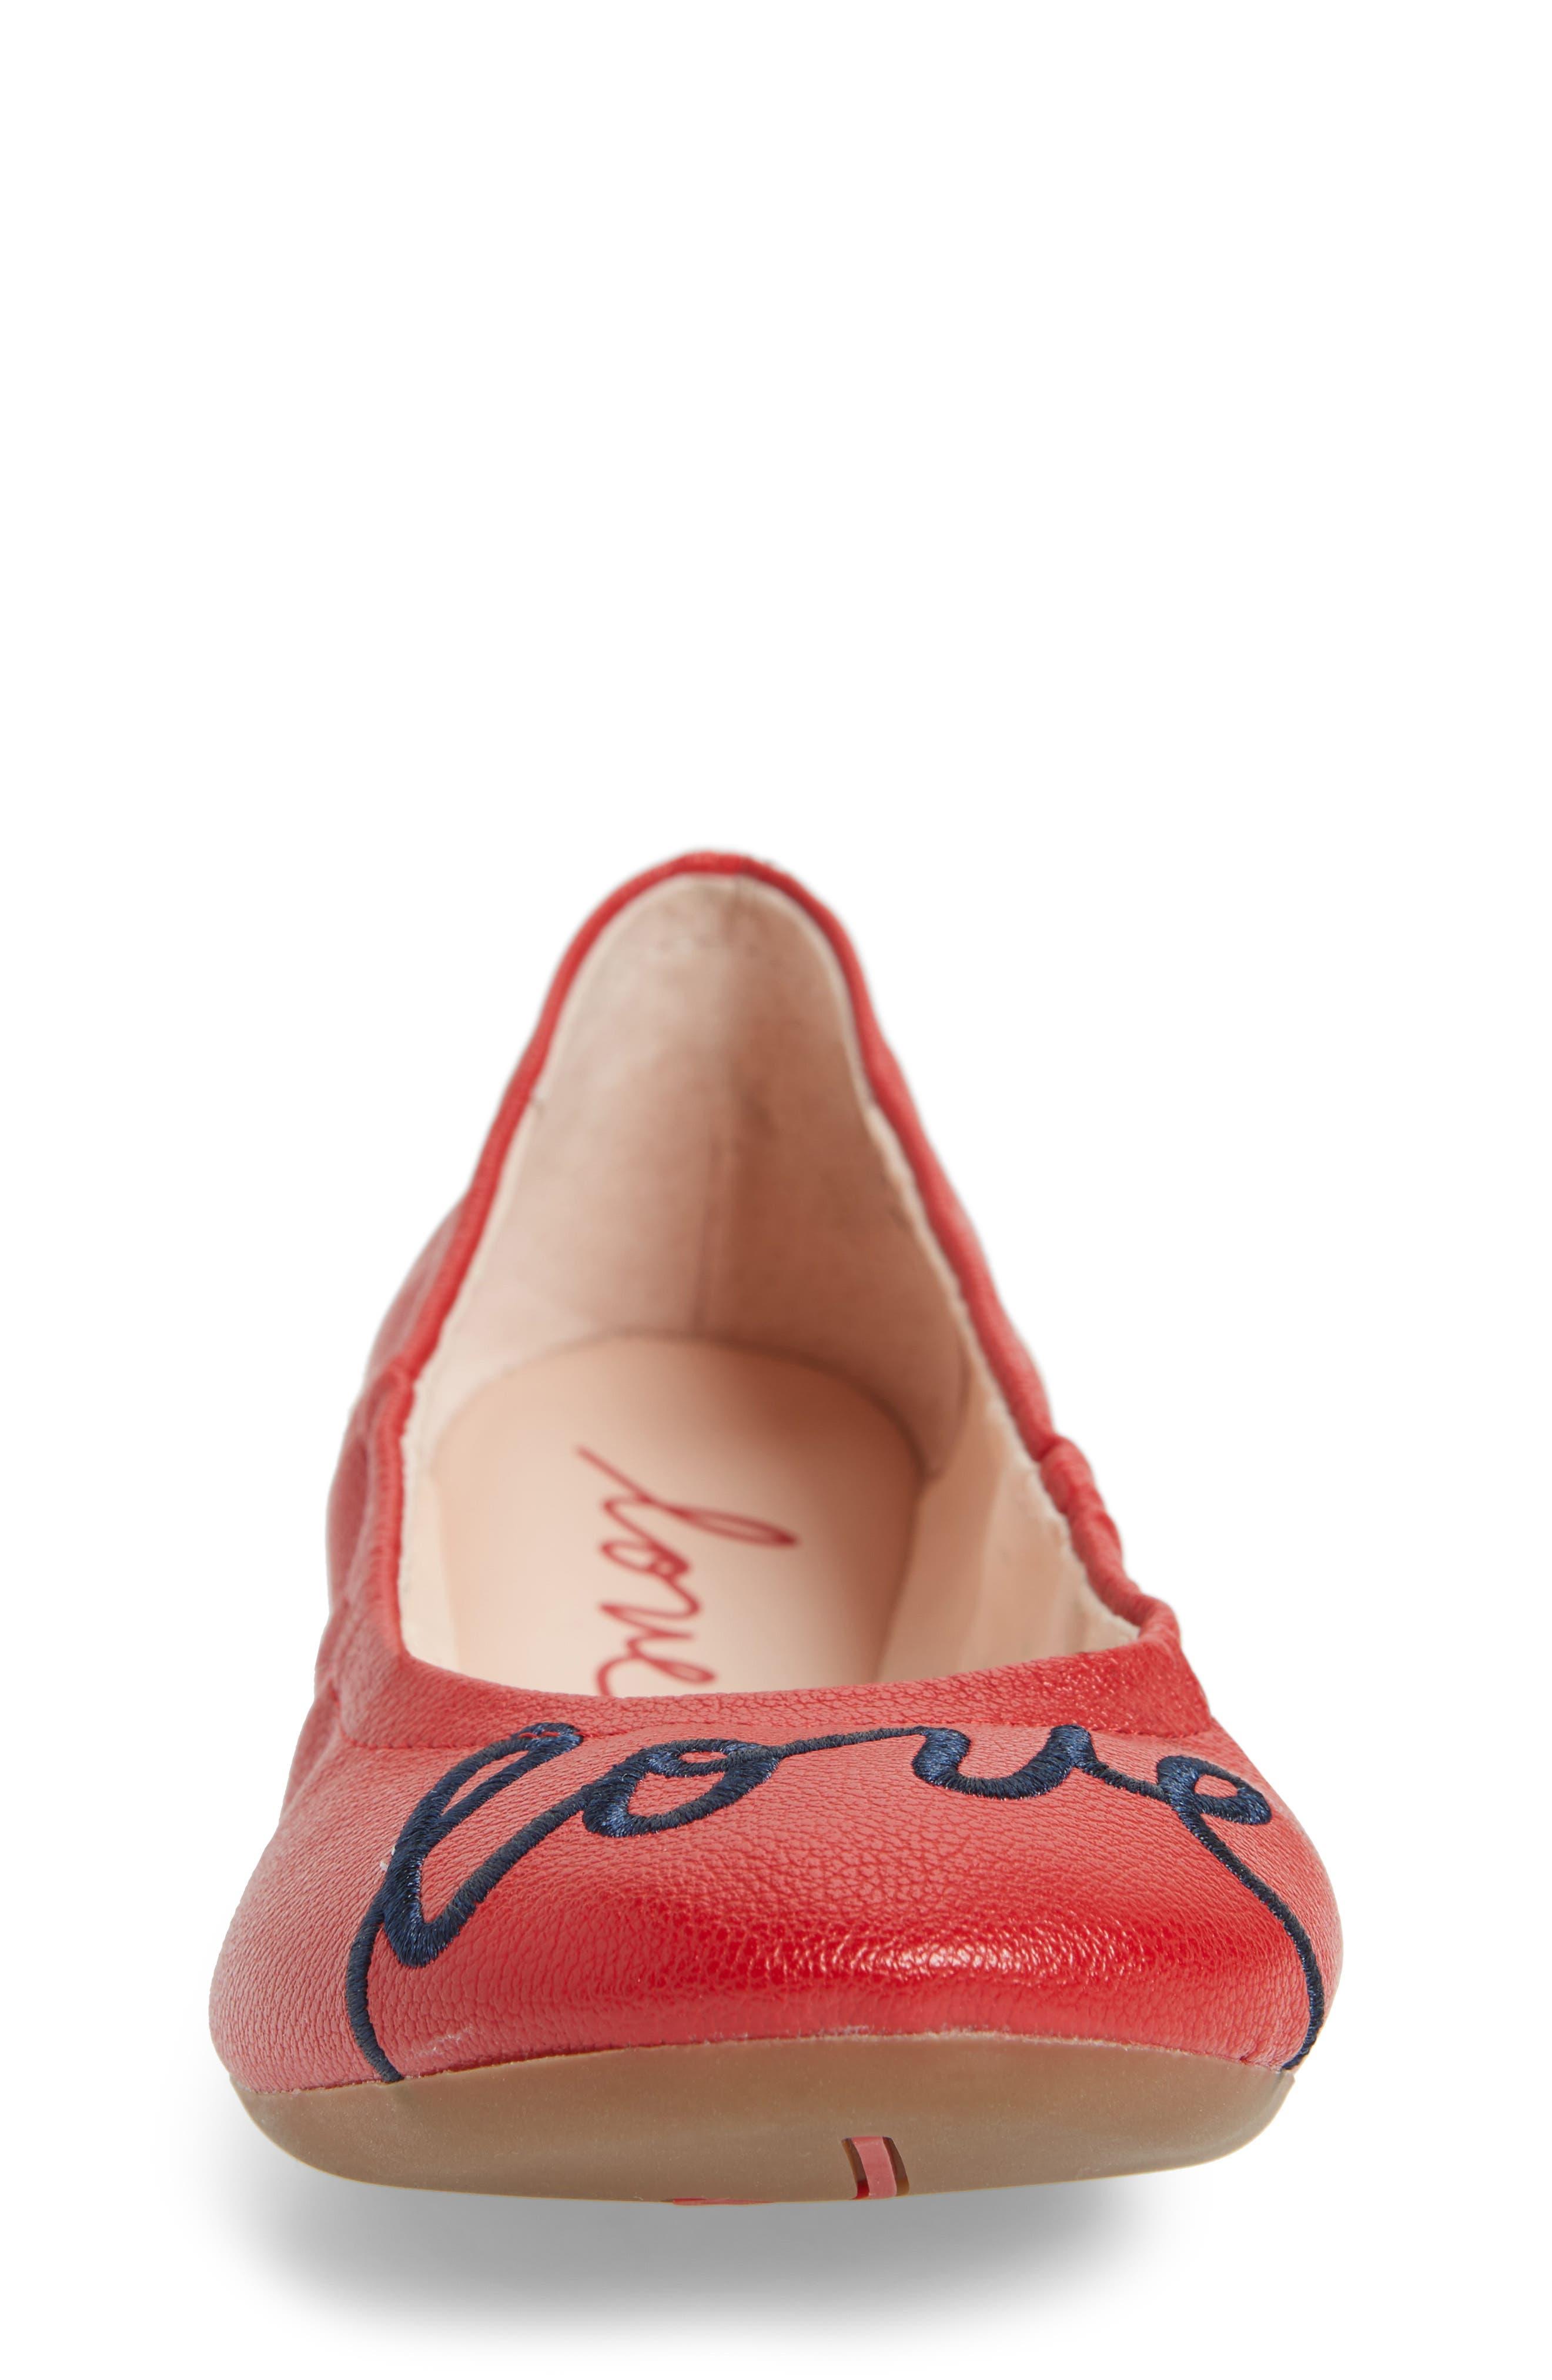 Langlee Embroidered Ballet Flat,                             Alternate thumbnail 4, color,                             SALSA